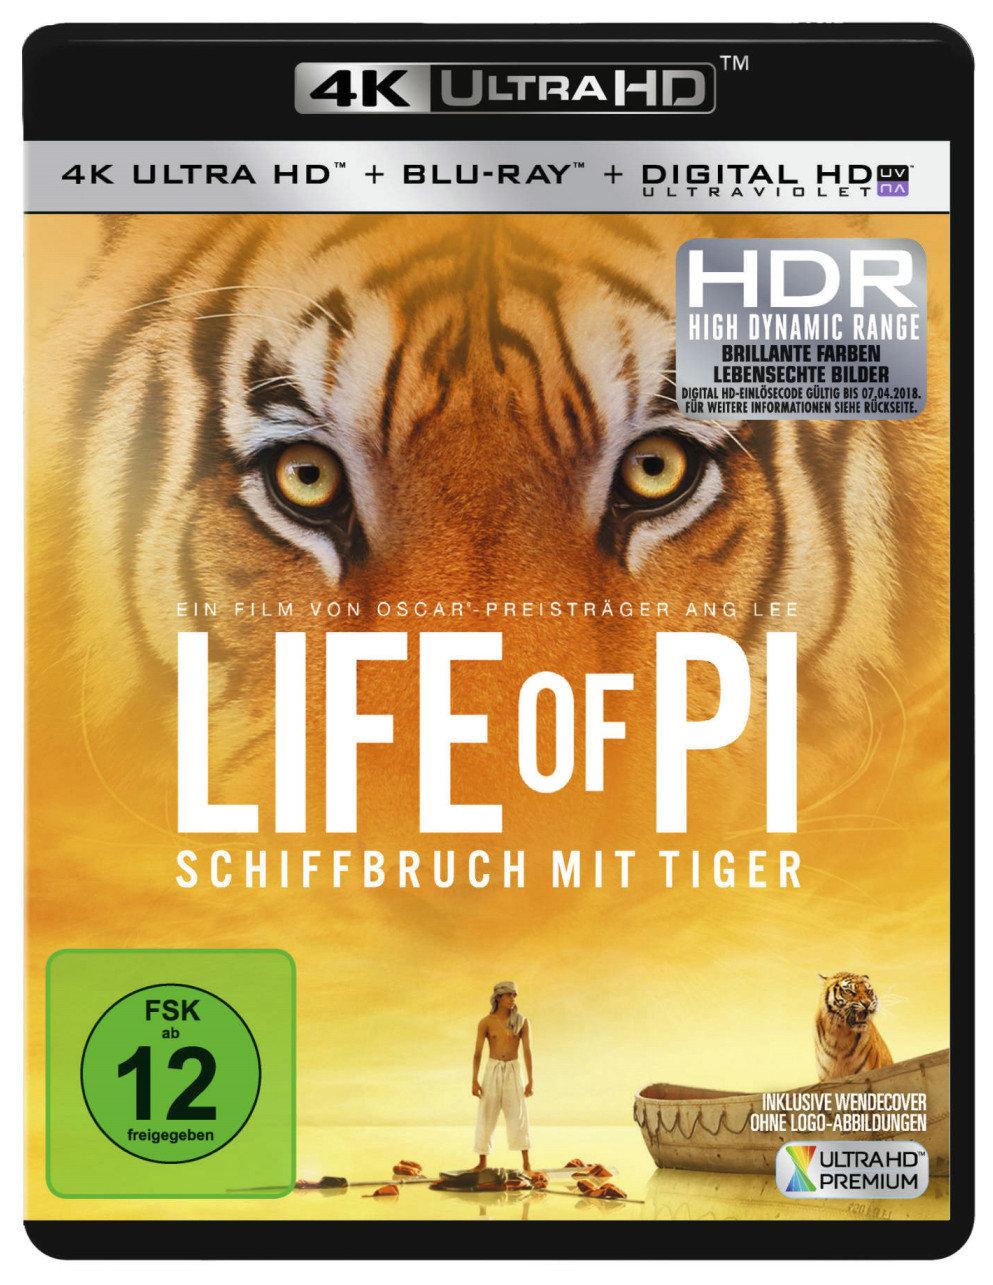 Life of Pi - Schiffbruch mit Tiger 4K (2012) - (4K Ultra HD & Blu-ray)